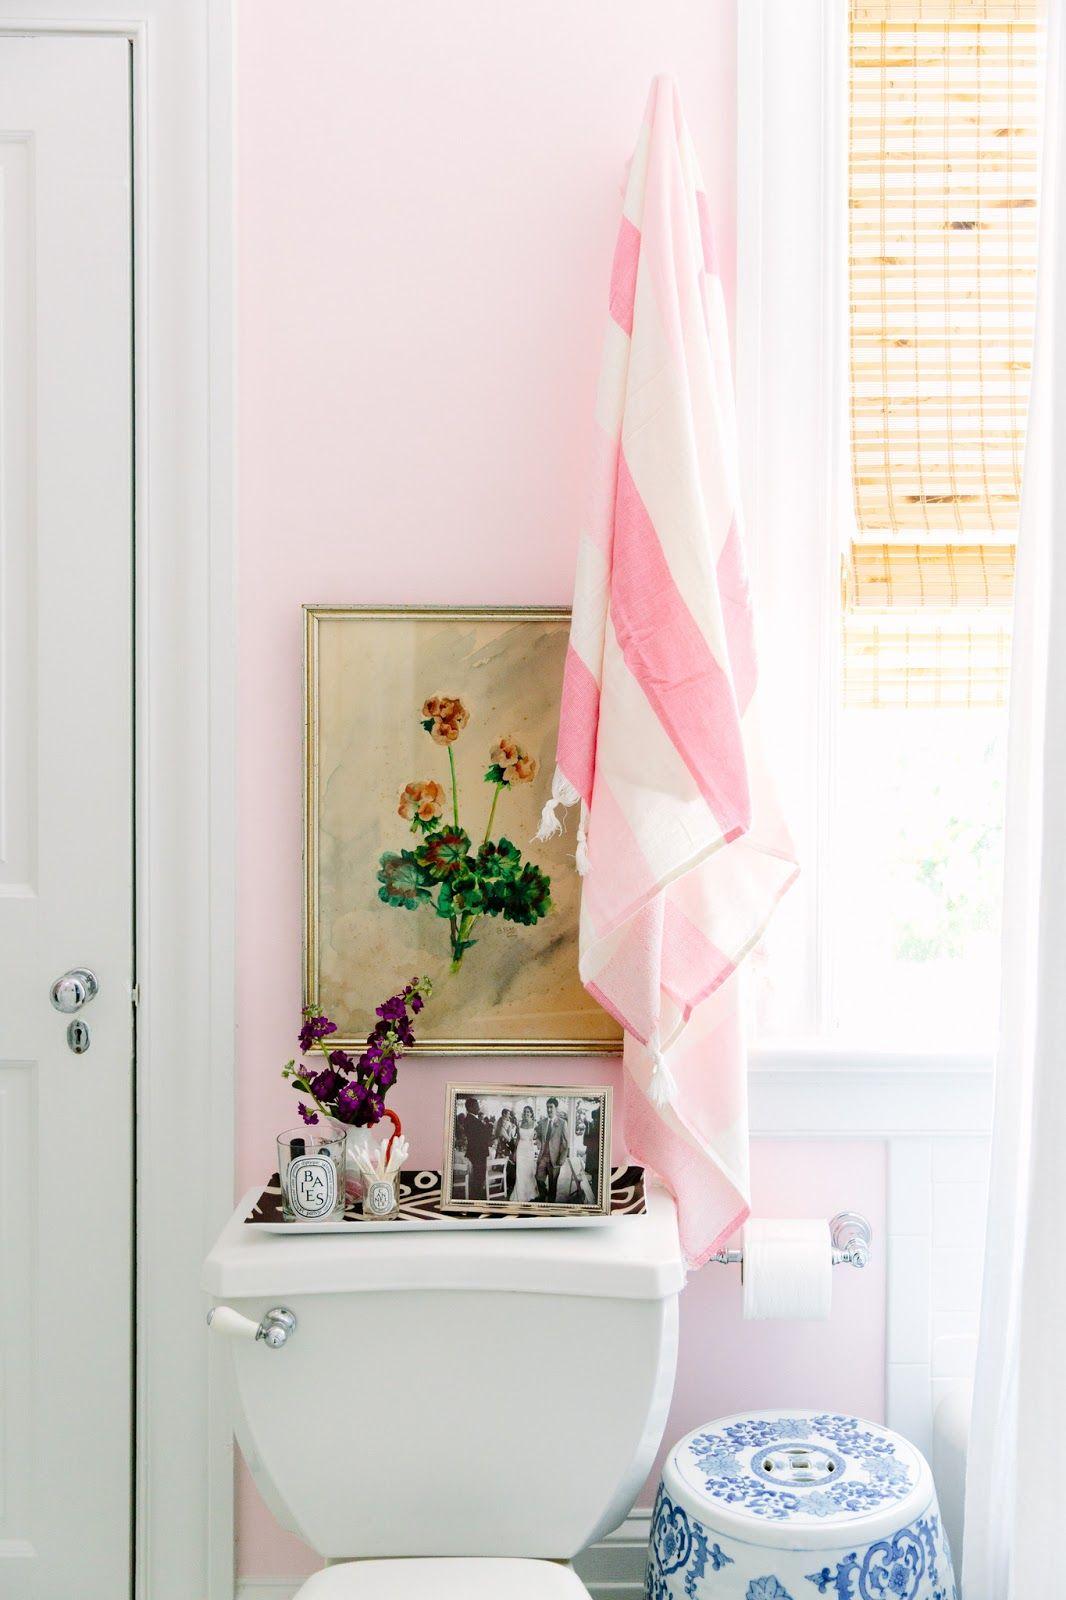 baby blush pink bathroom color vintage art above the toilet